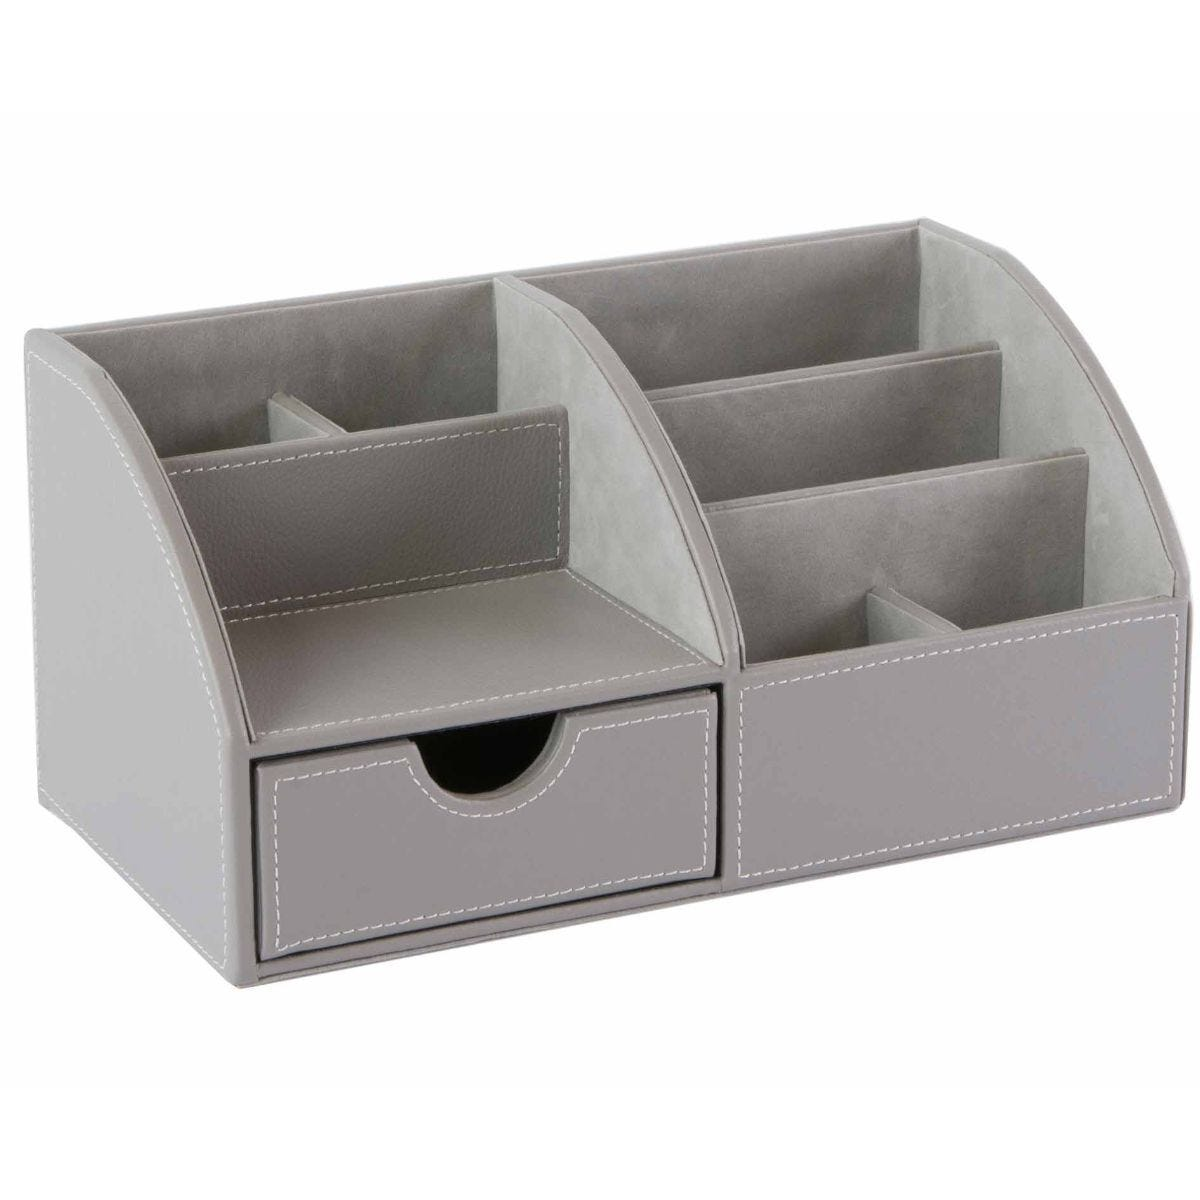 Osco Desk Organiser Grey Faux Leather